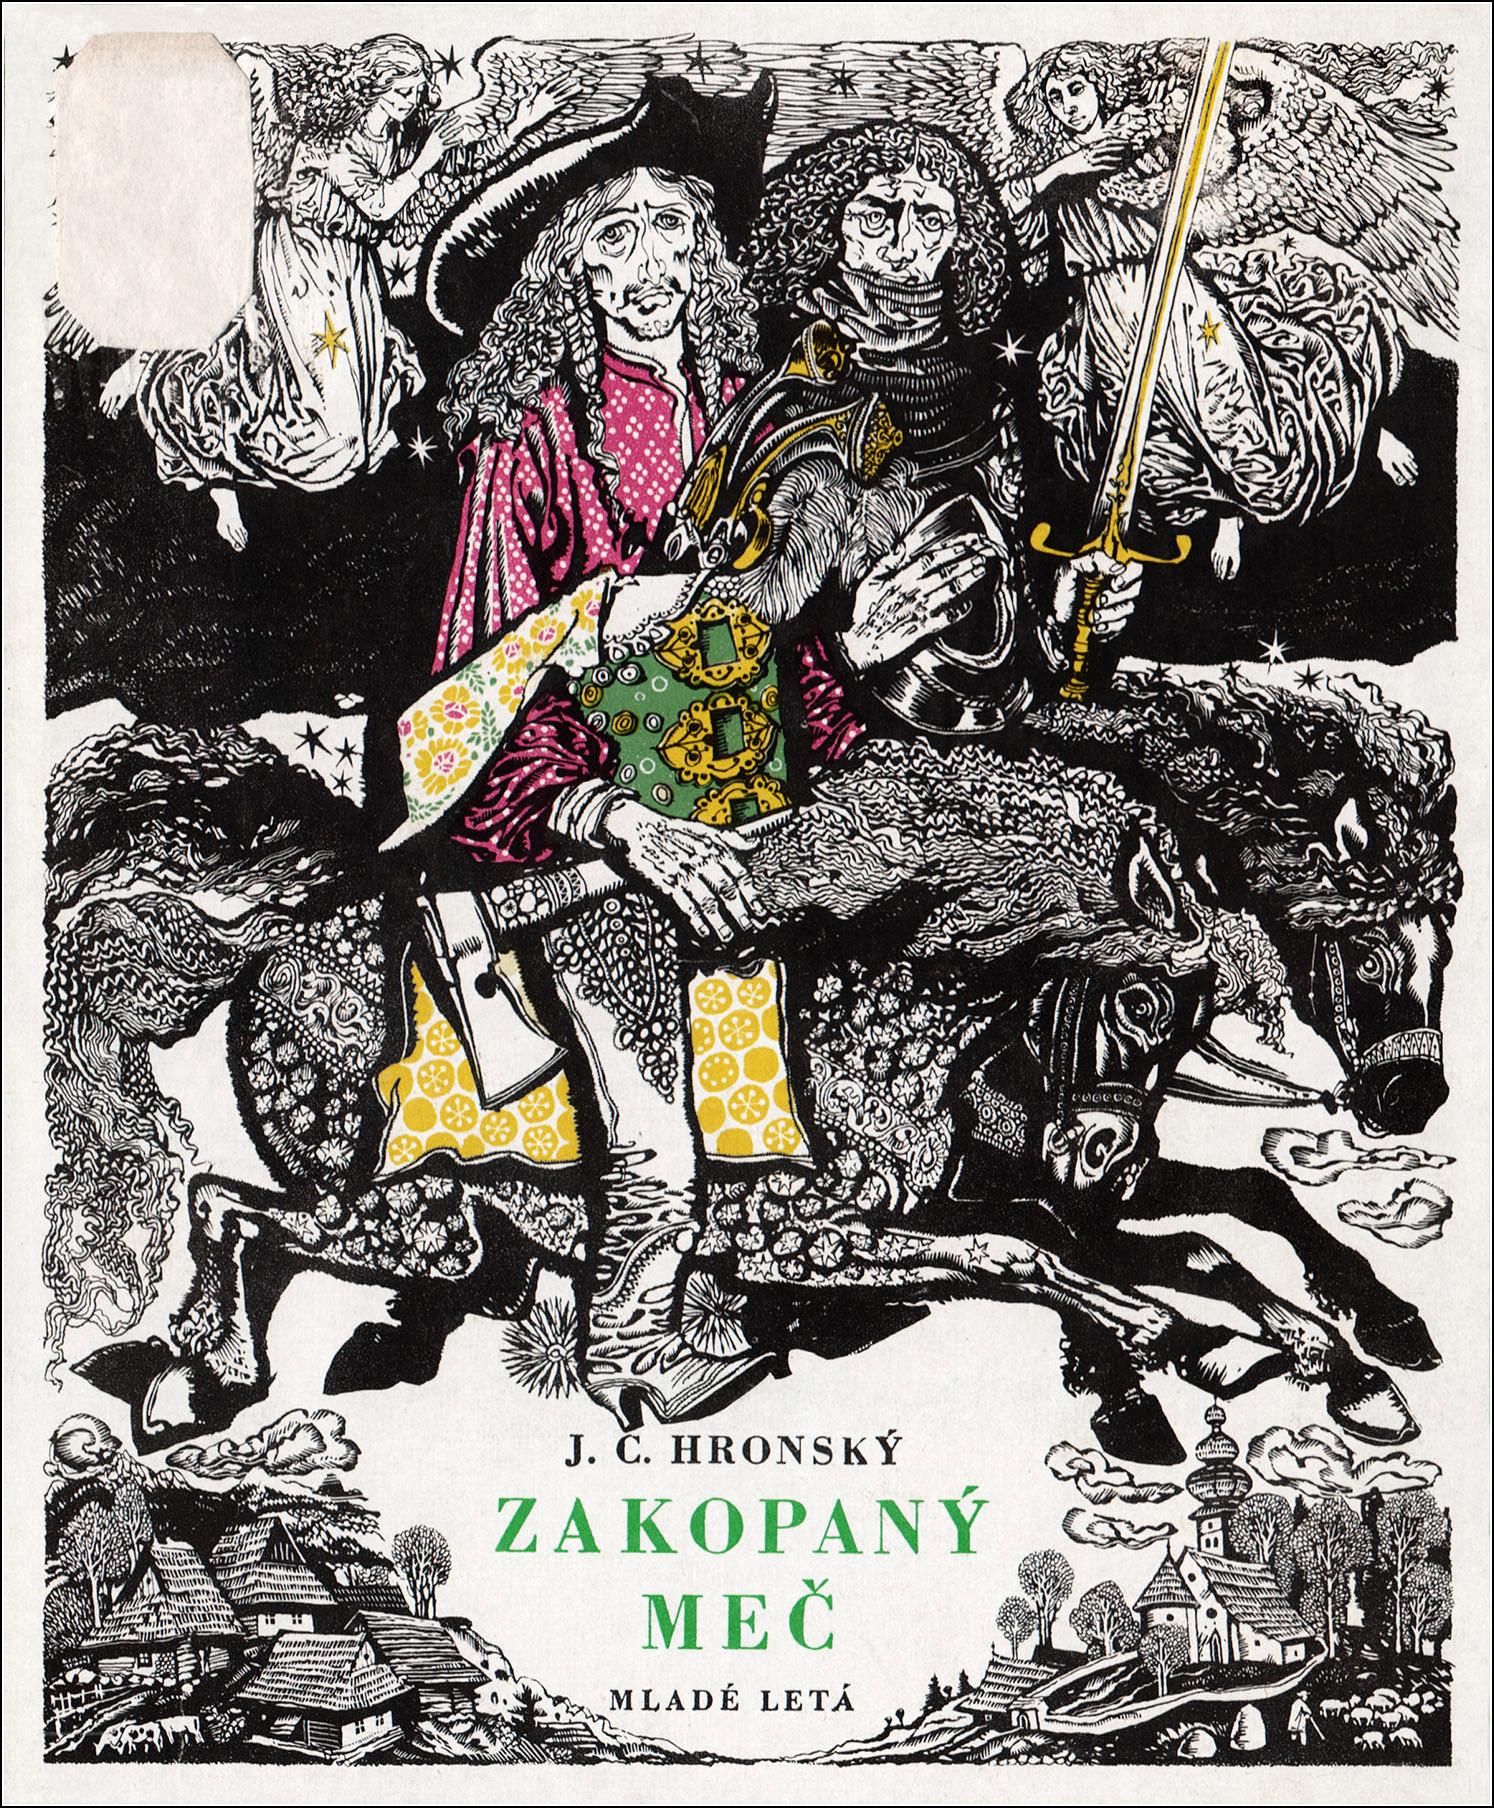 Vladimír Machaj, Zakopany mec